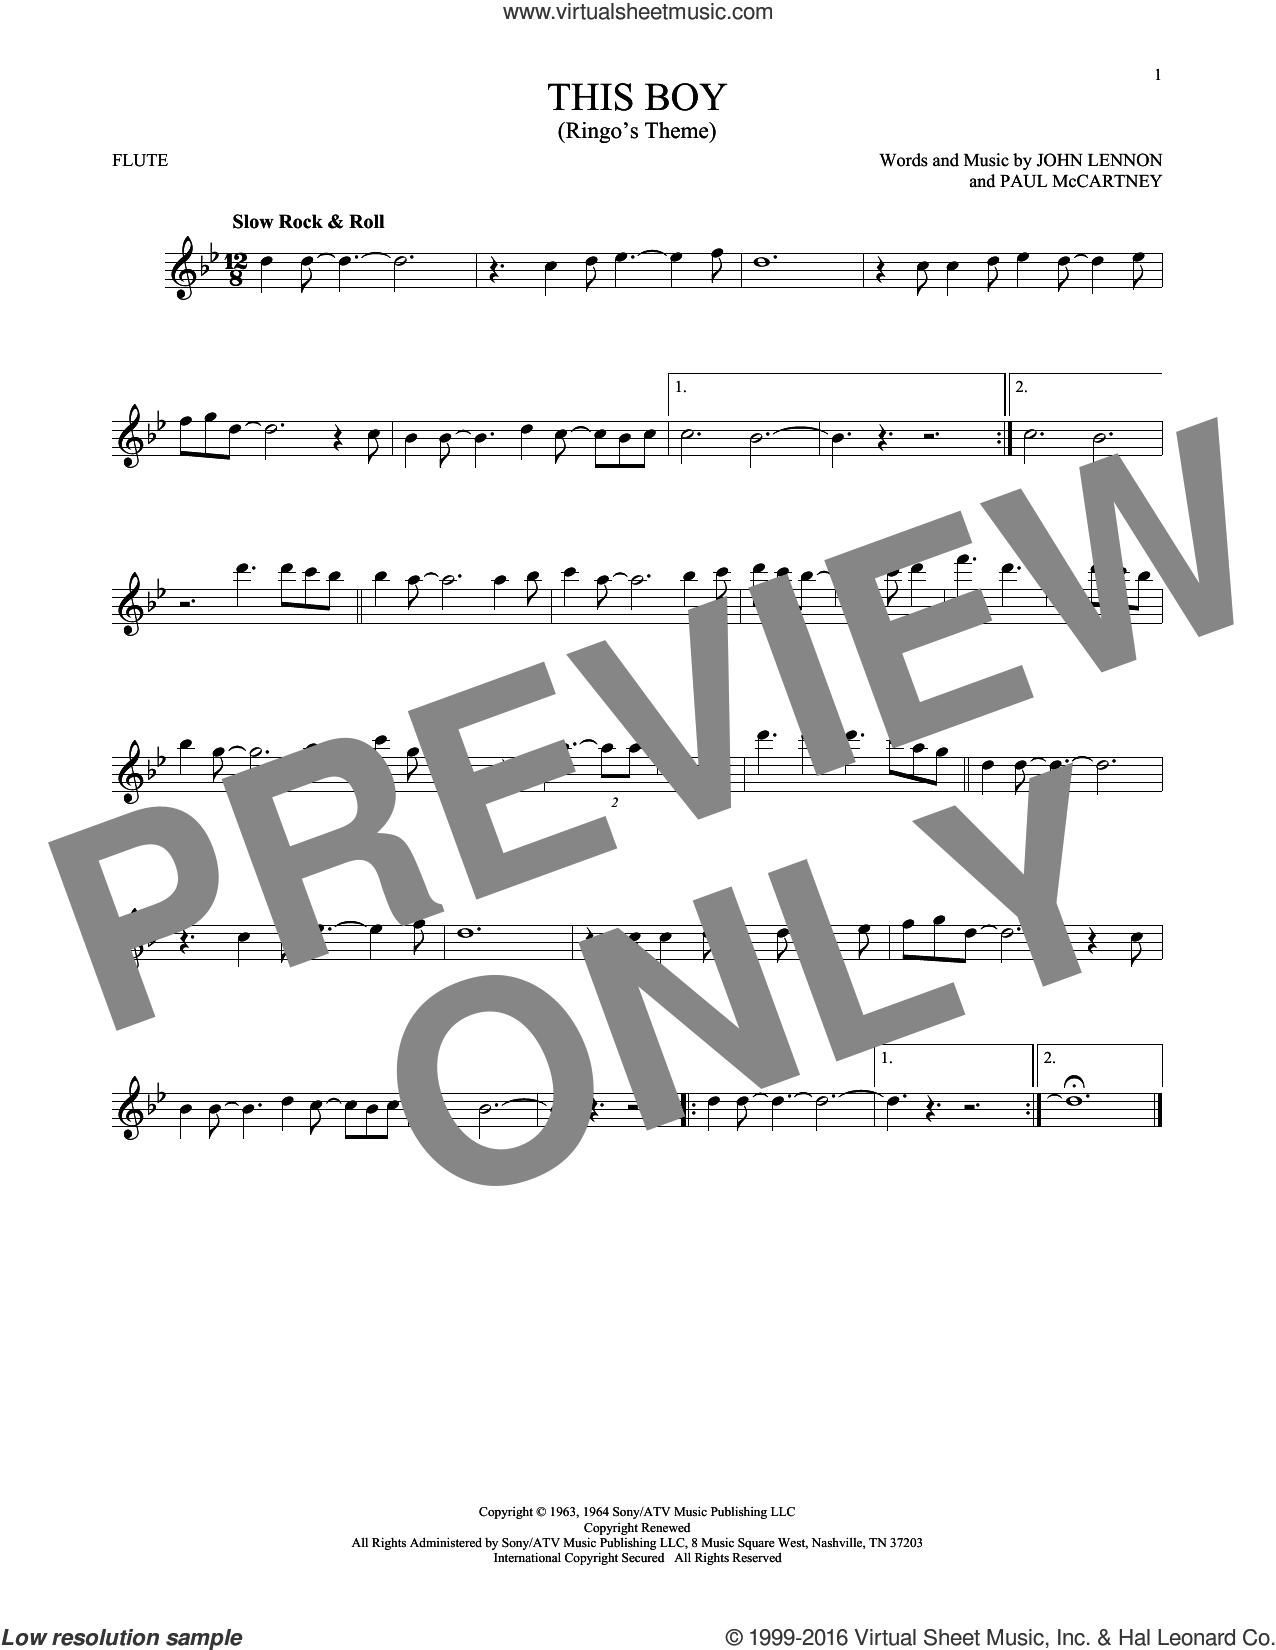 This Boy (Ringo's Theme) sheet music for flute solo by The Beatles, John Lennon and Paul McCartney, intermediate skill level